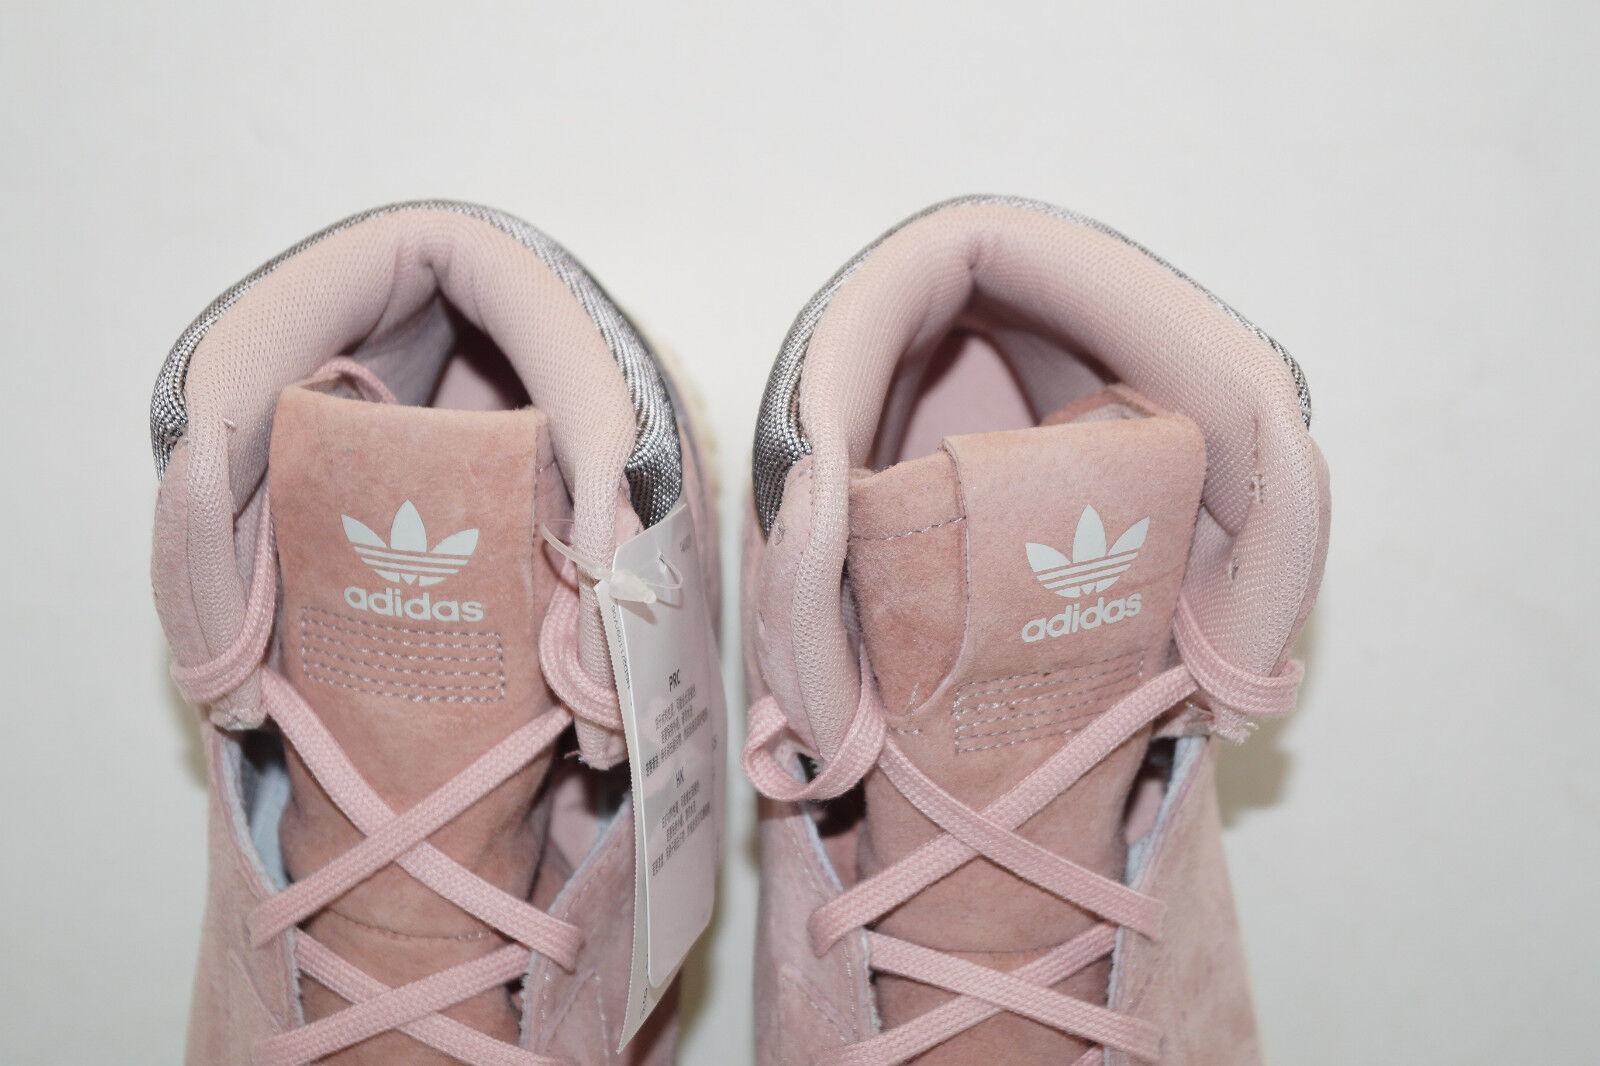 Adidas originals TUBULAR INVADER 2.0 pink W 41.3 UK 7.5 pink 2.0 S80555 Sneakers 883e5c